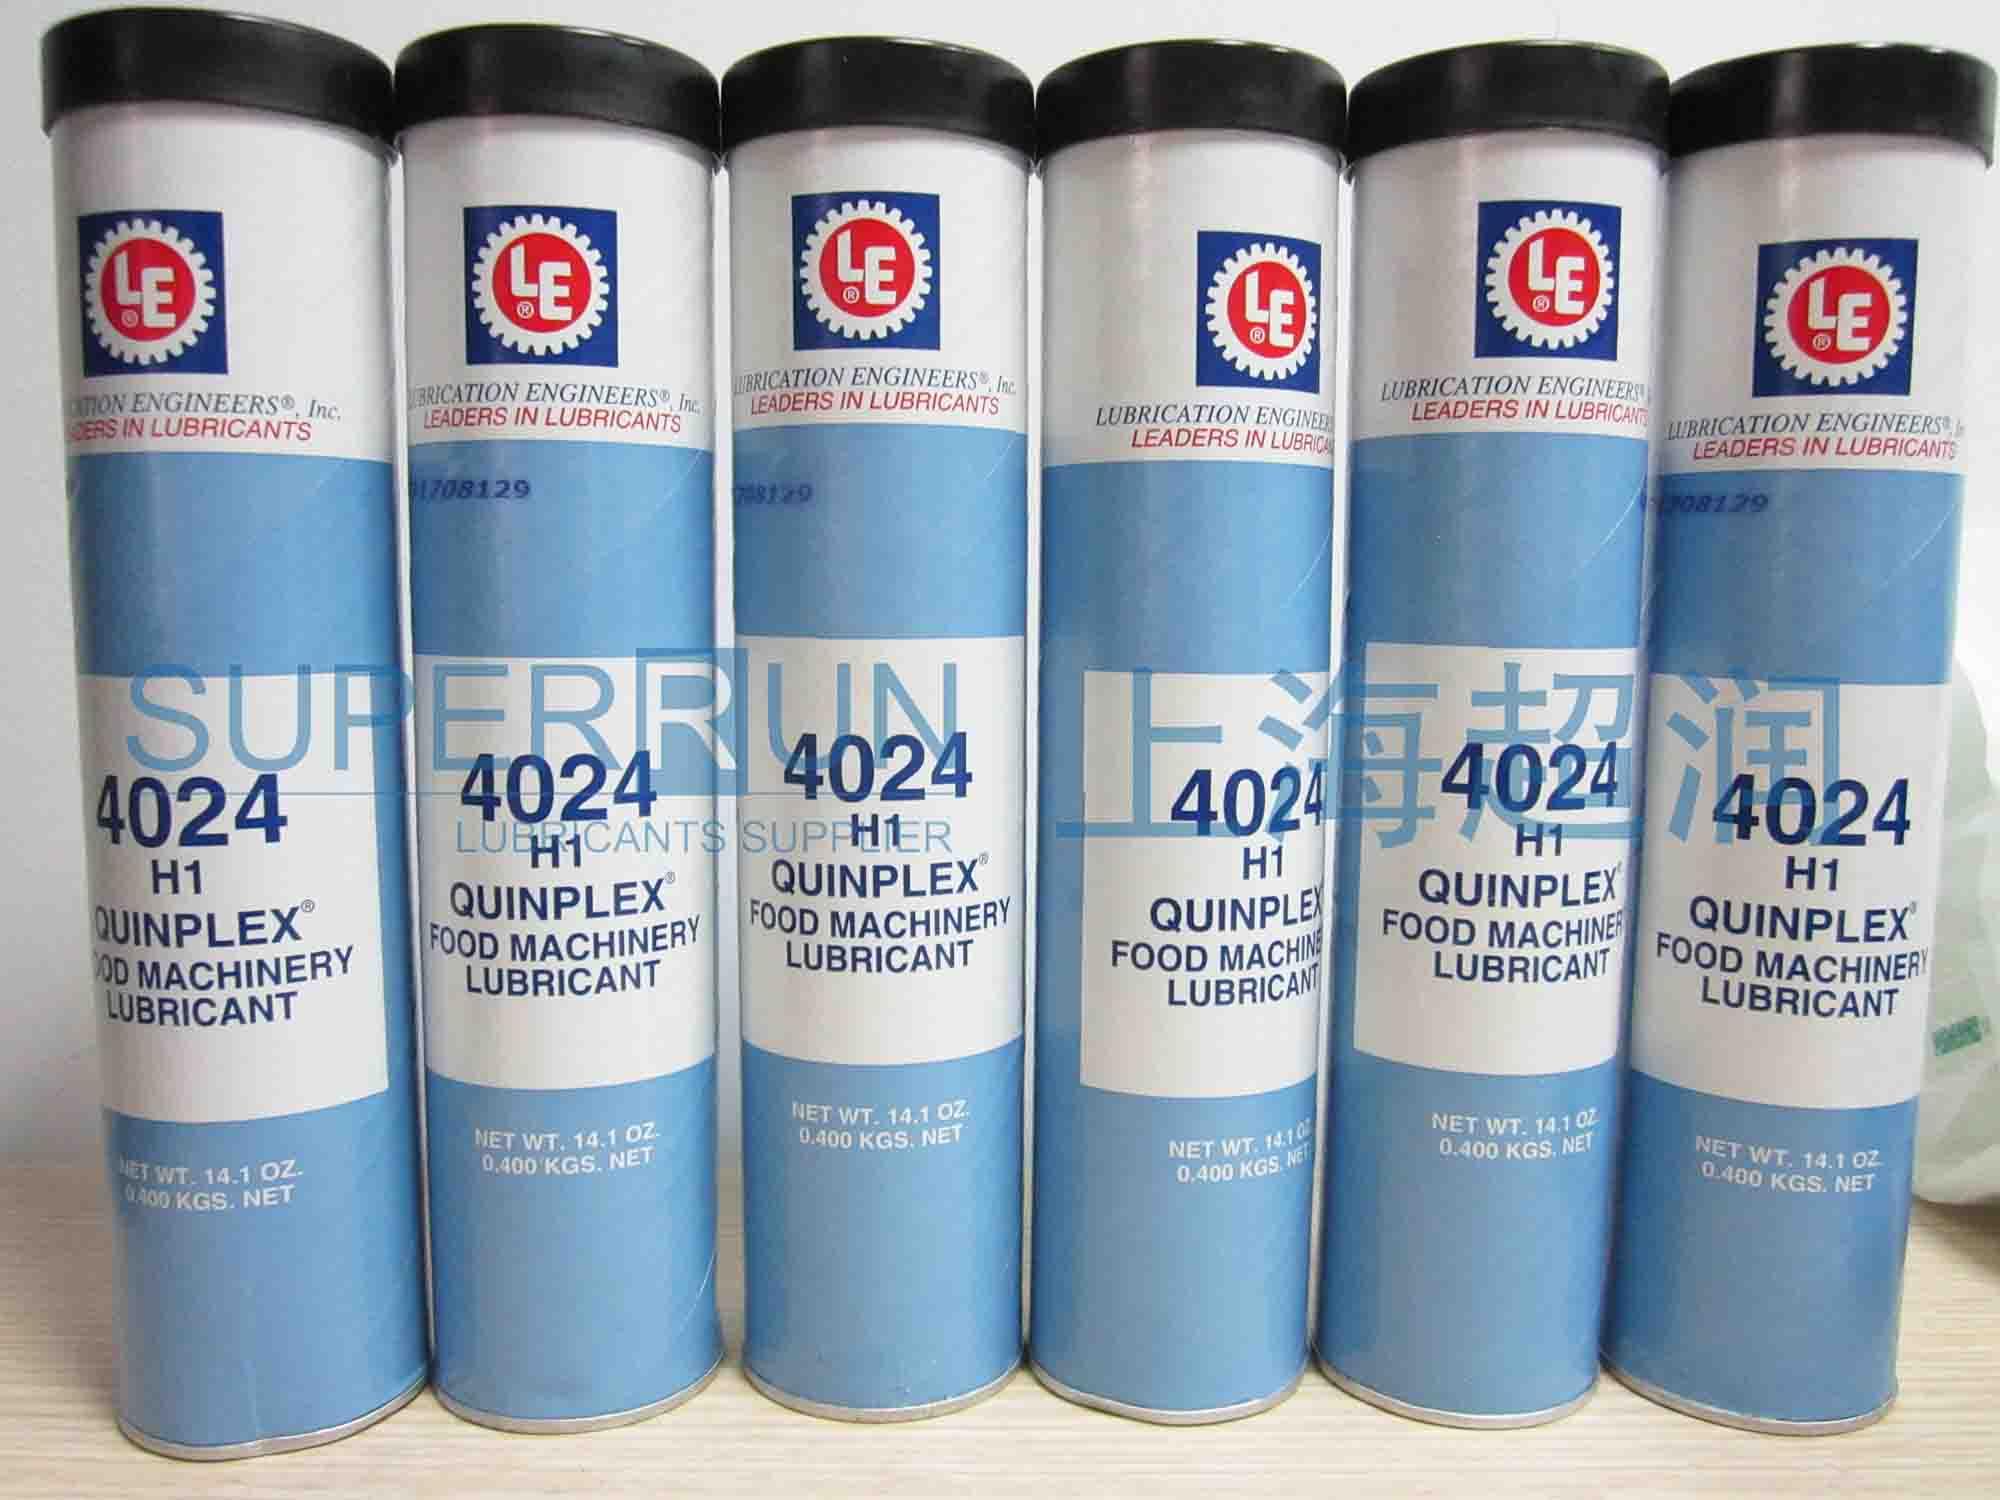 LE 4024 食品机械润滑剂